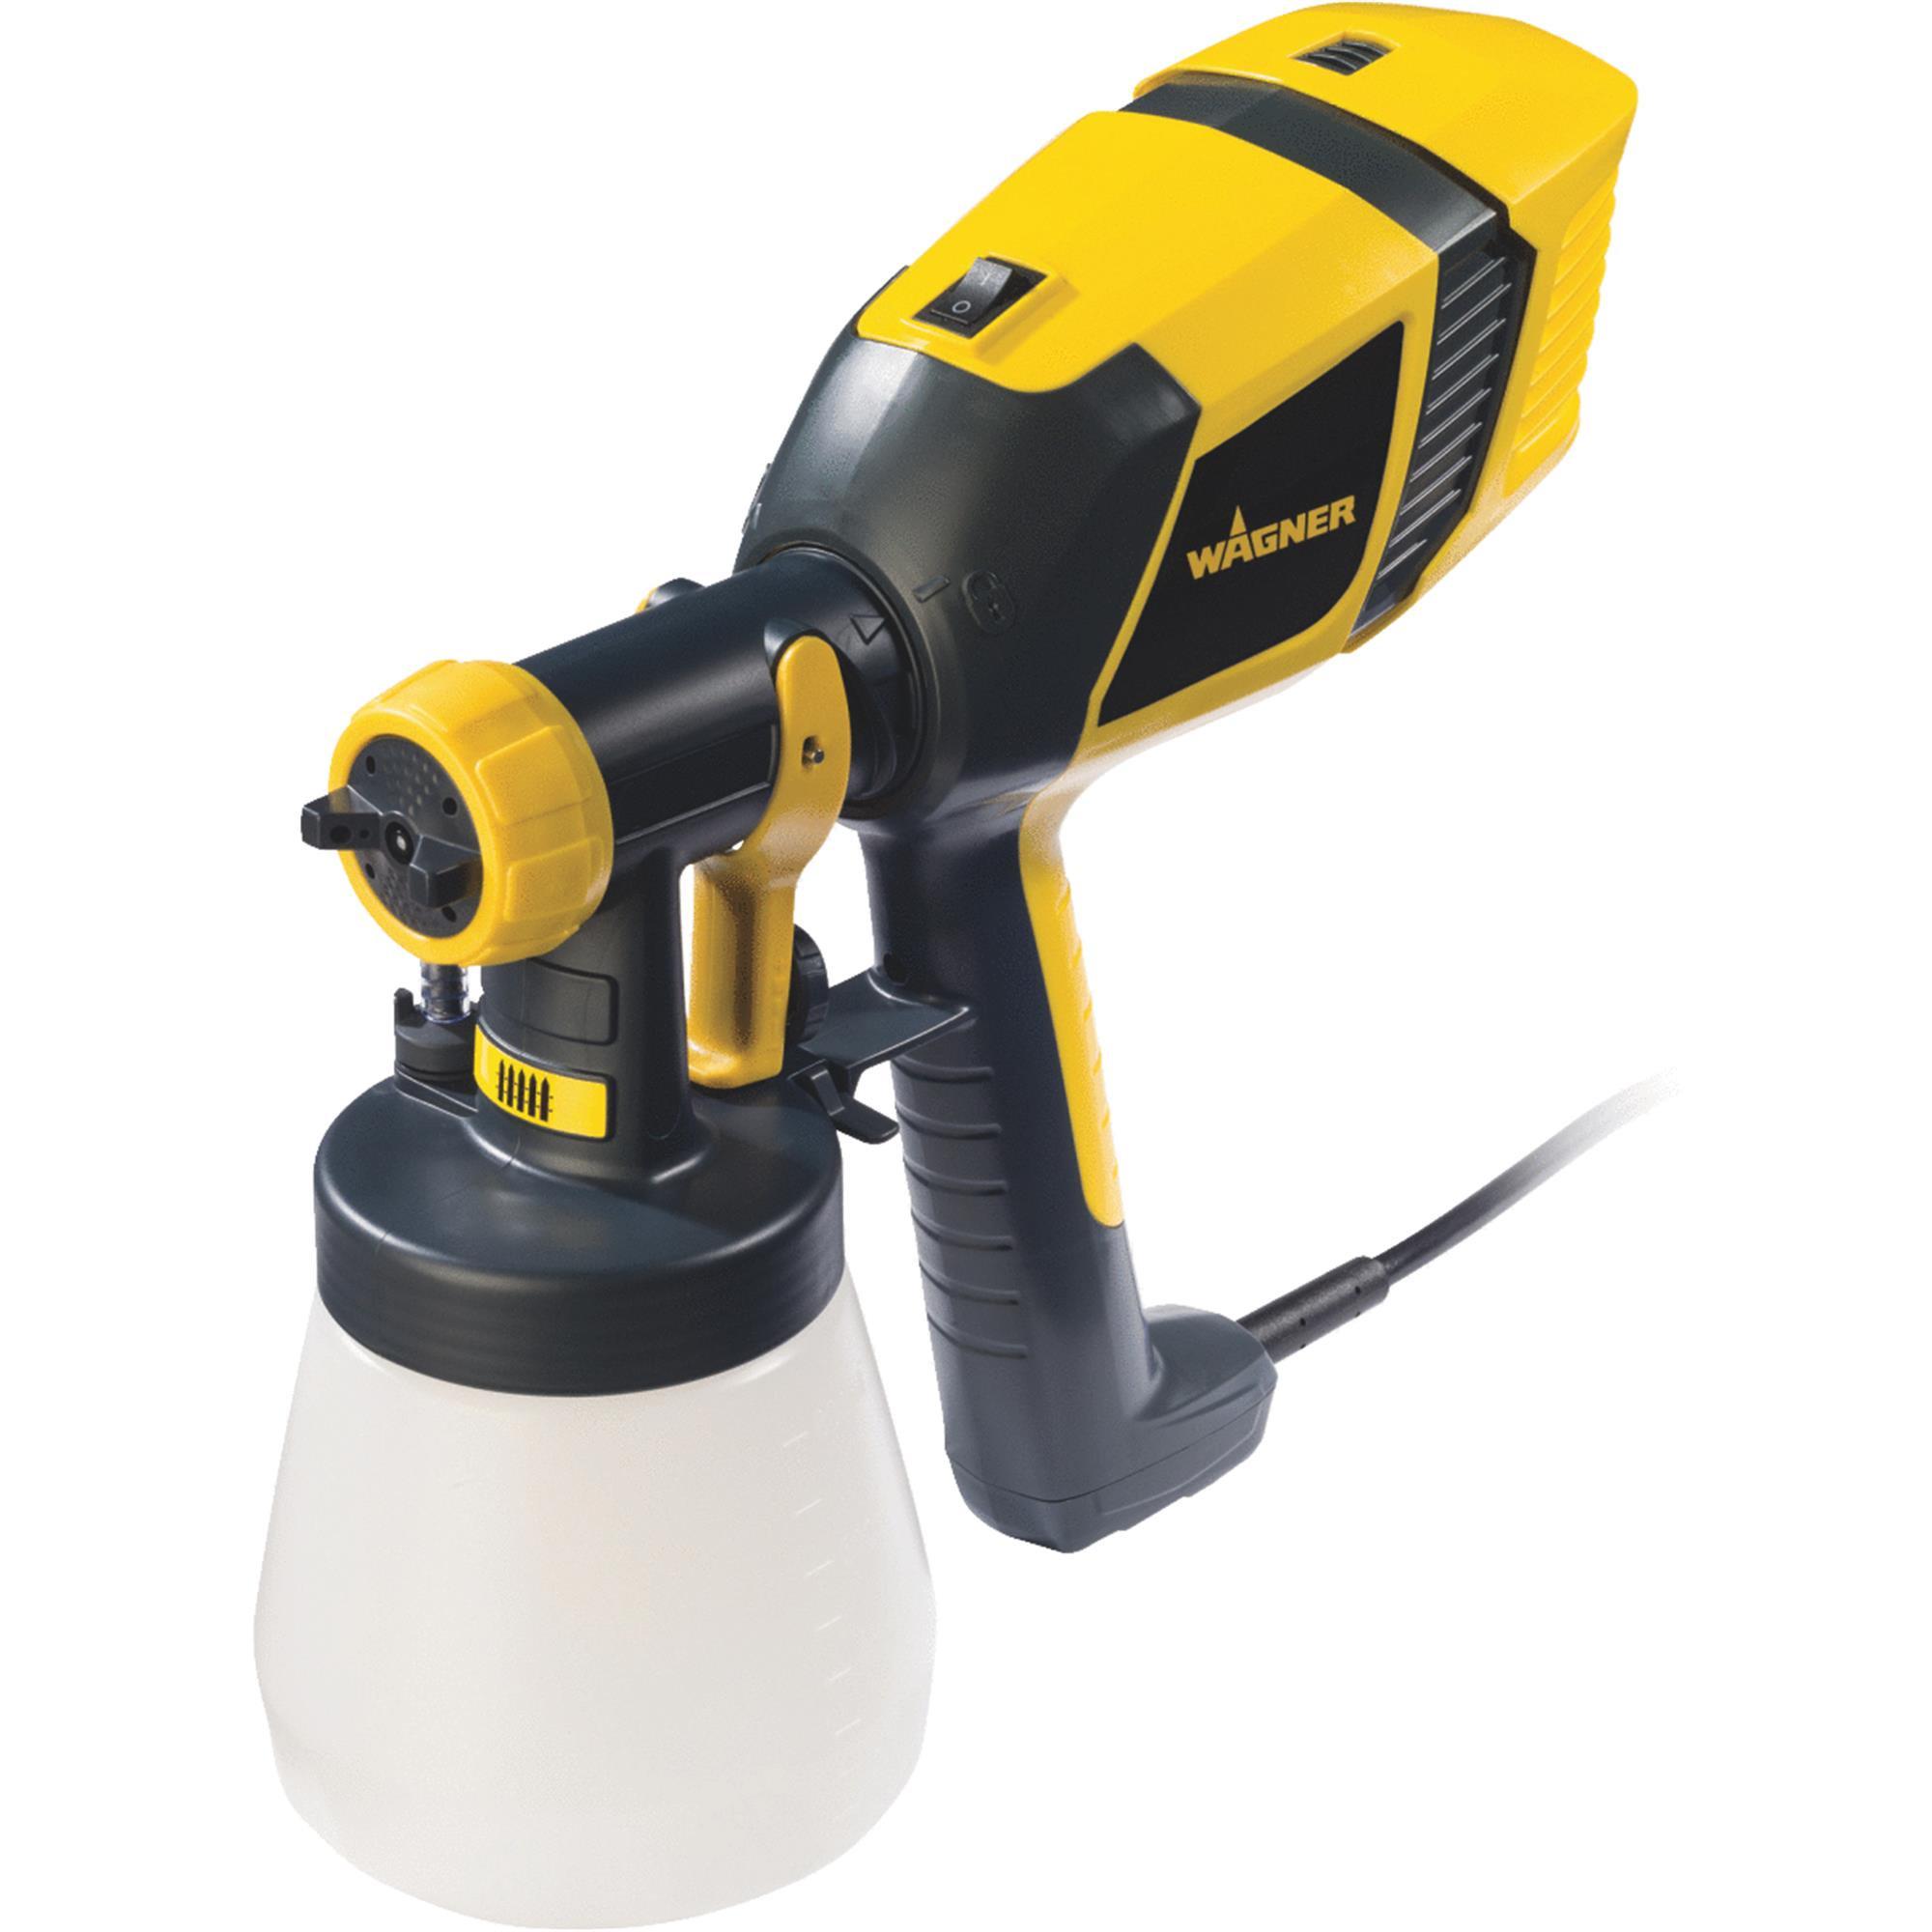 Wagner Control Spray 250 Paint Sprayer by Wagner Spray Tech